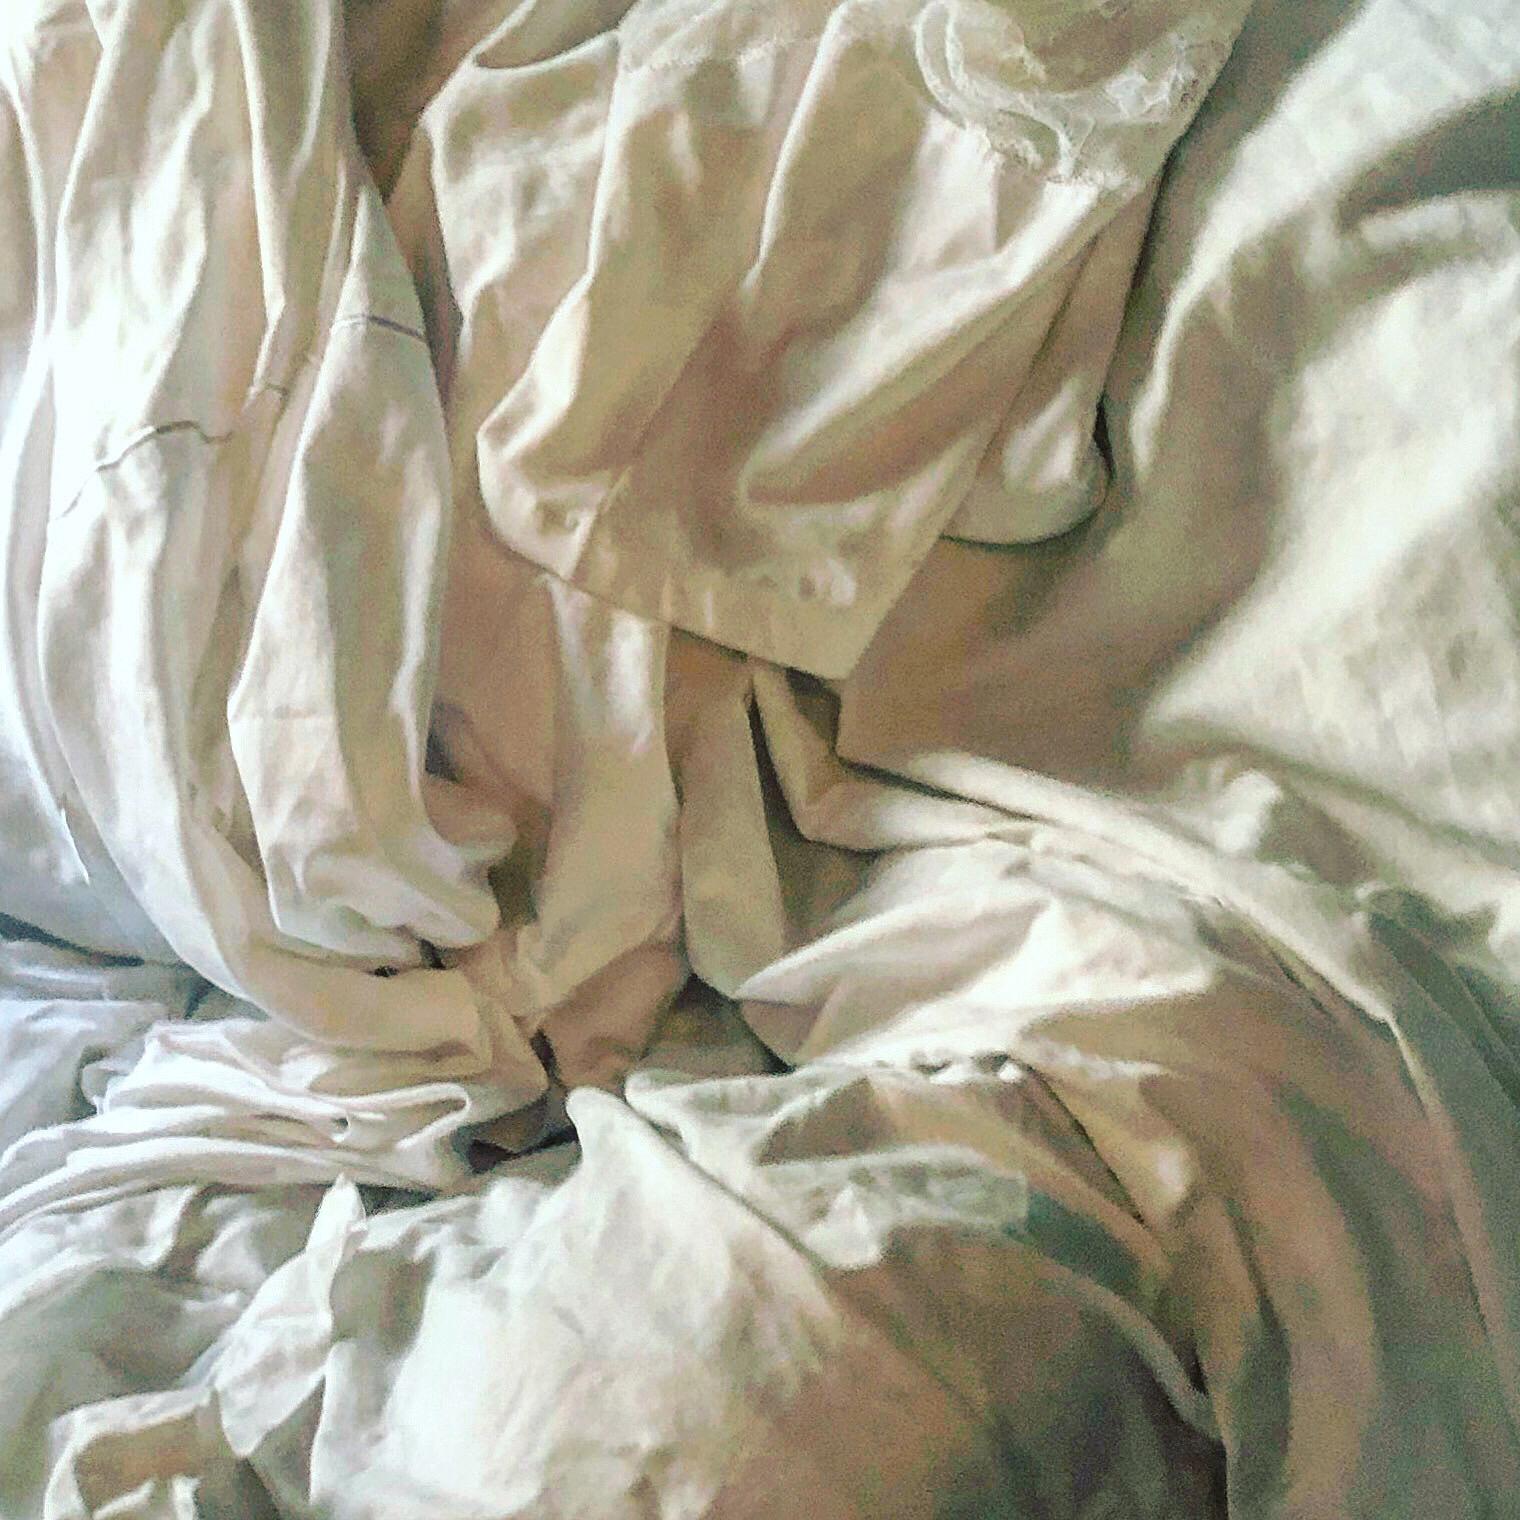 Drying Sheets 2